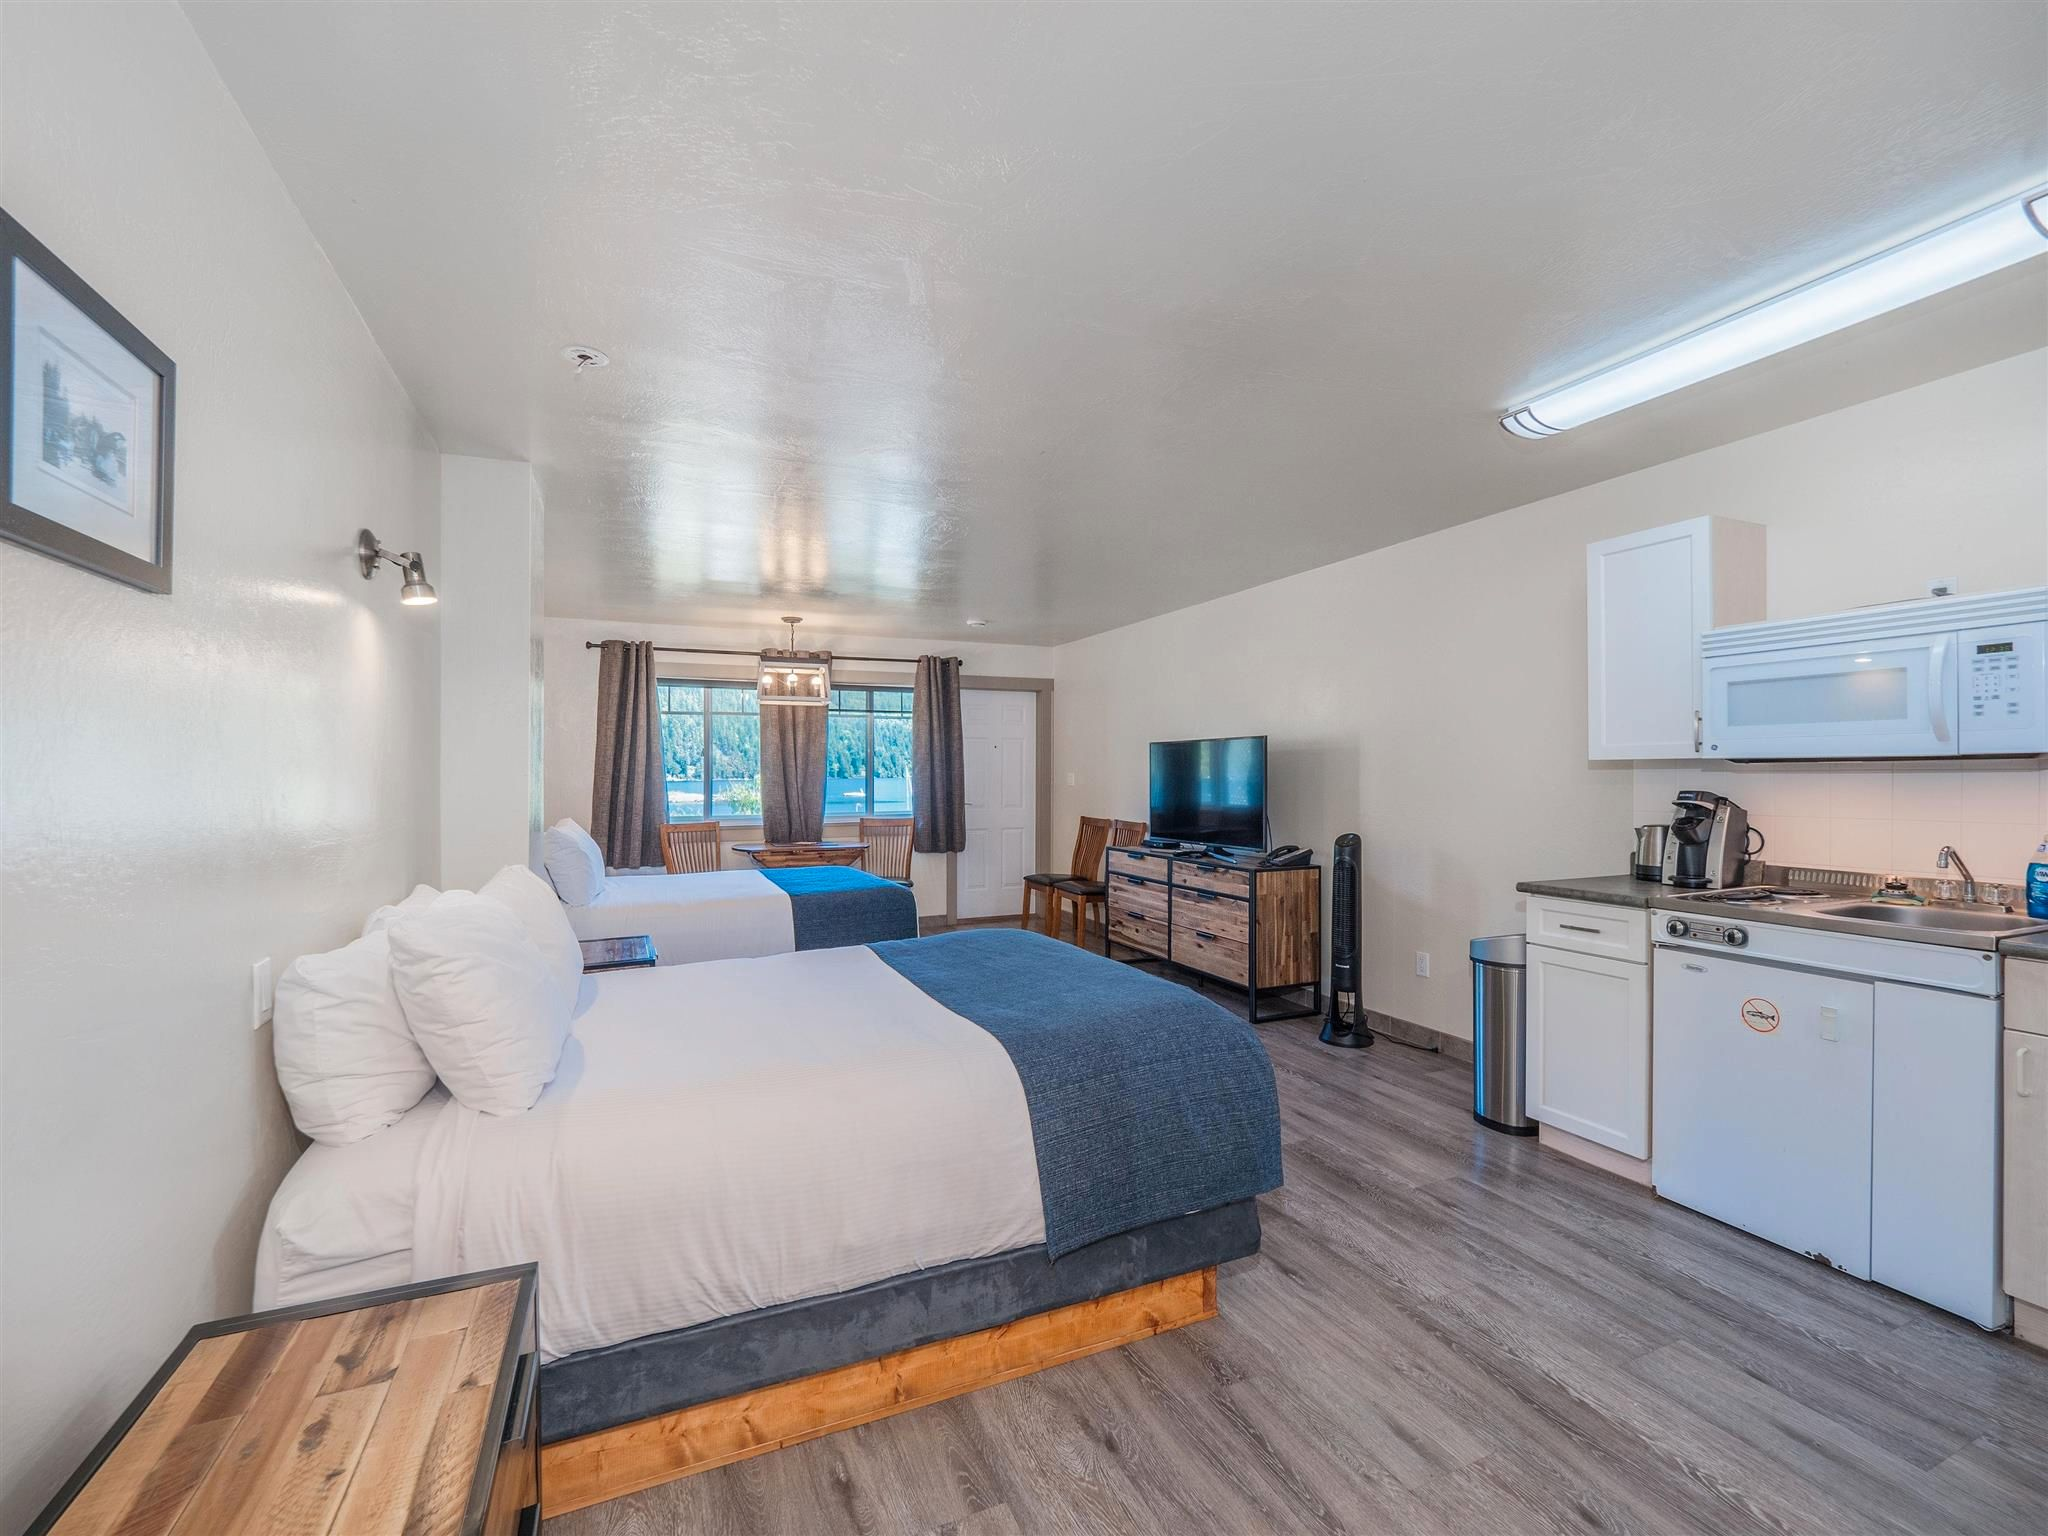 Photo 33: Photos: 6781 BATHGATE Road in Egmont: Pender Harbour Egmont House for sale (Sunshine Coast)  : MLS®# R2593981